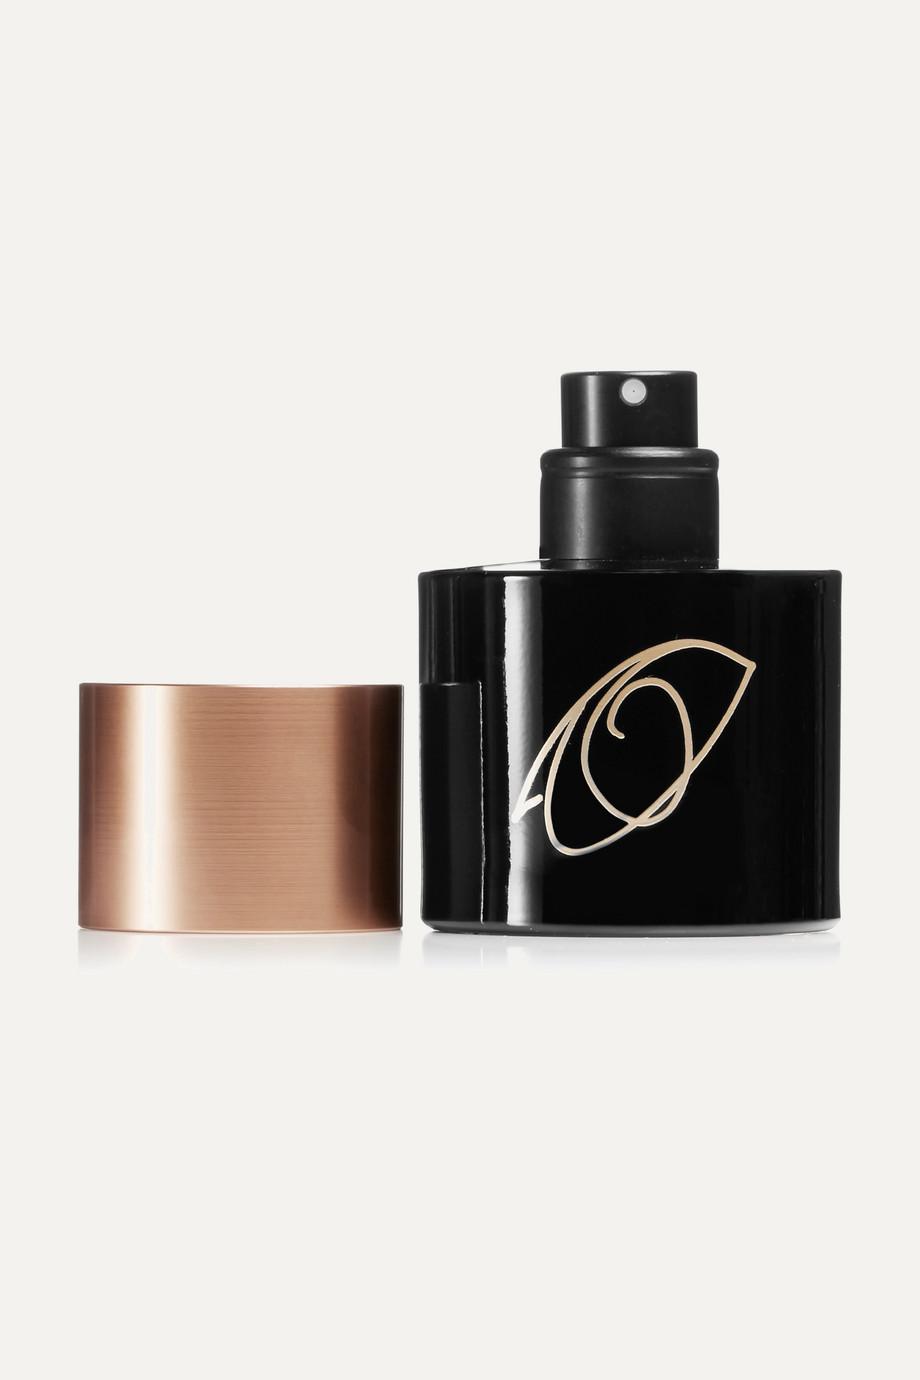 Frederic Malle Superstitious Eau de Parfum - Turkish Rose, Egyptian Jasmine & Aldehyde, 50ml